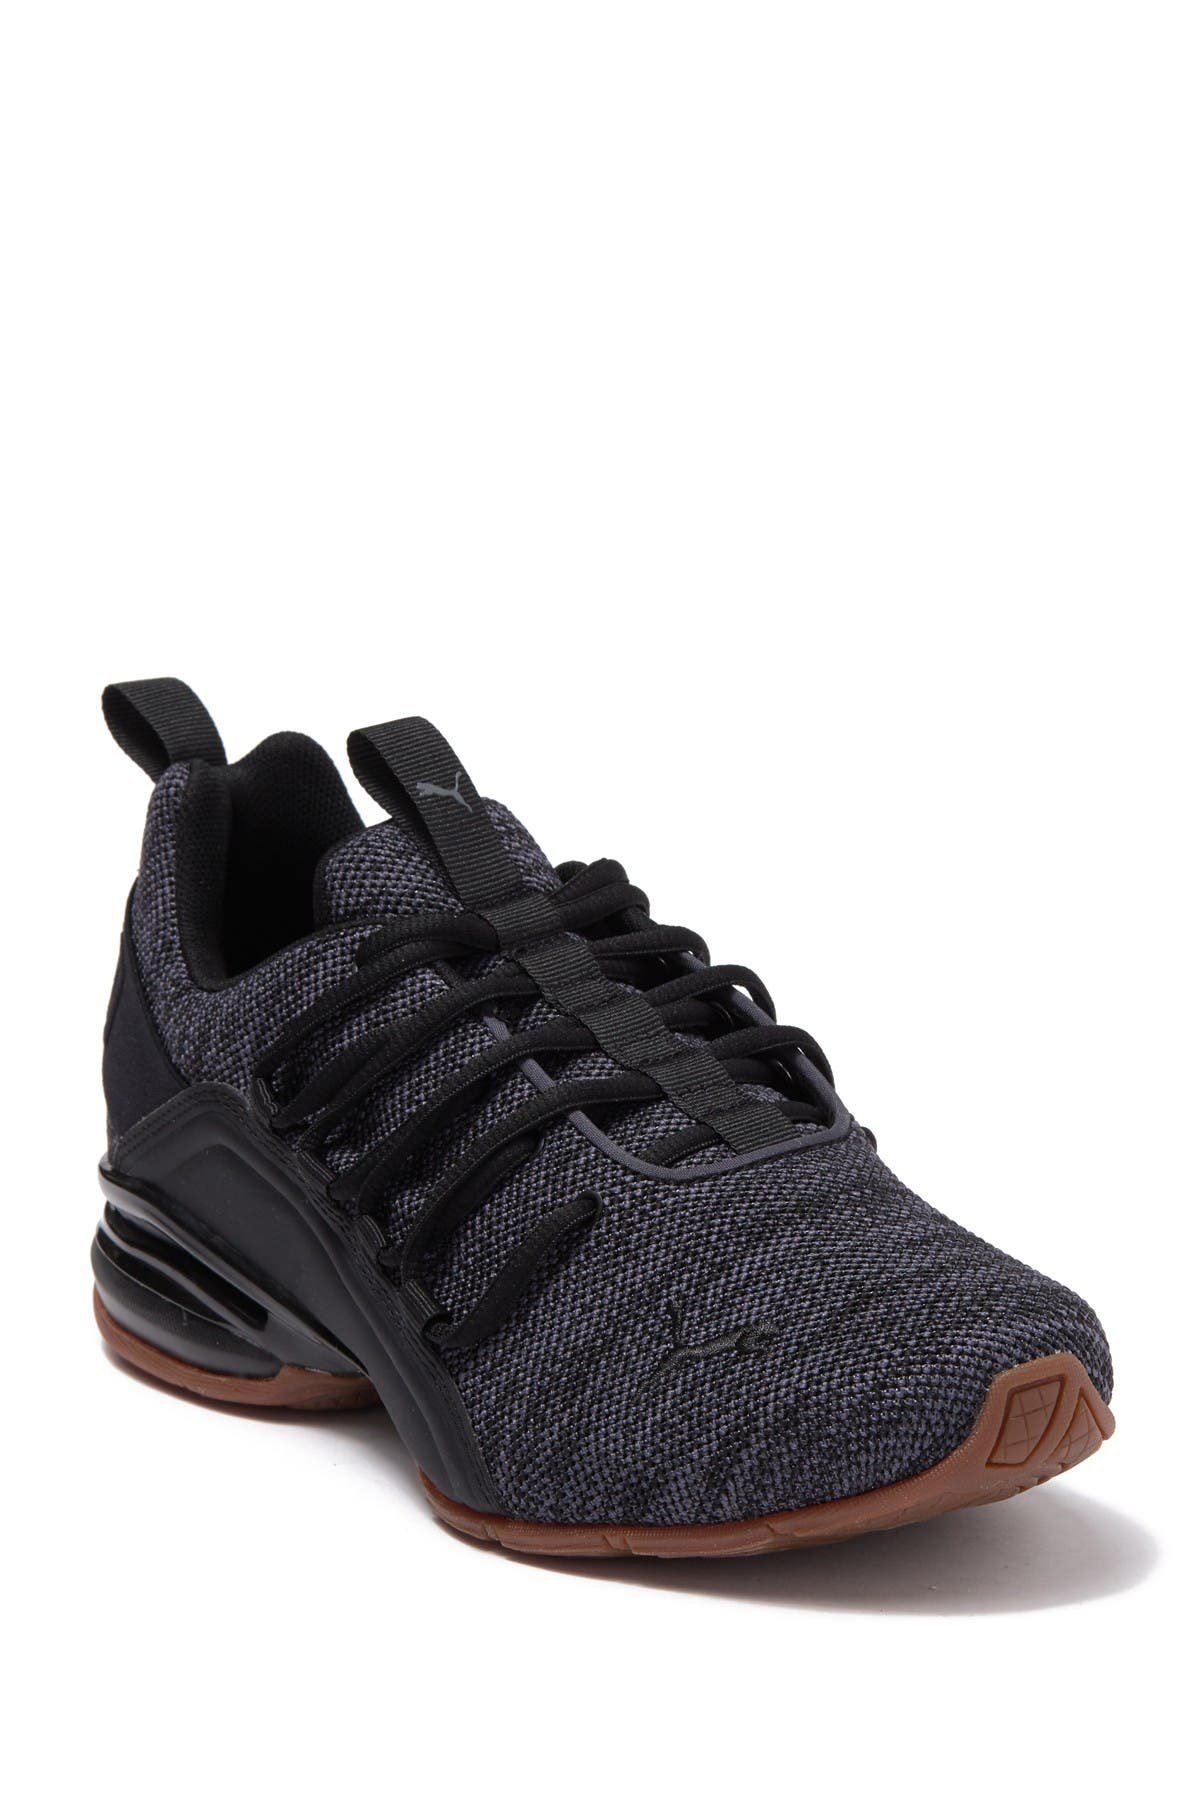 PUMA | Axelion Knit Training Sneaker